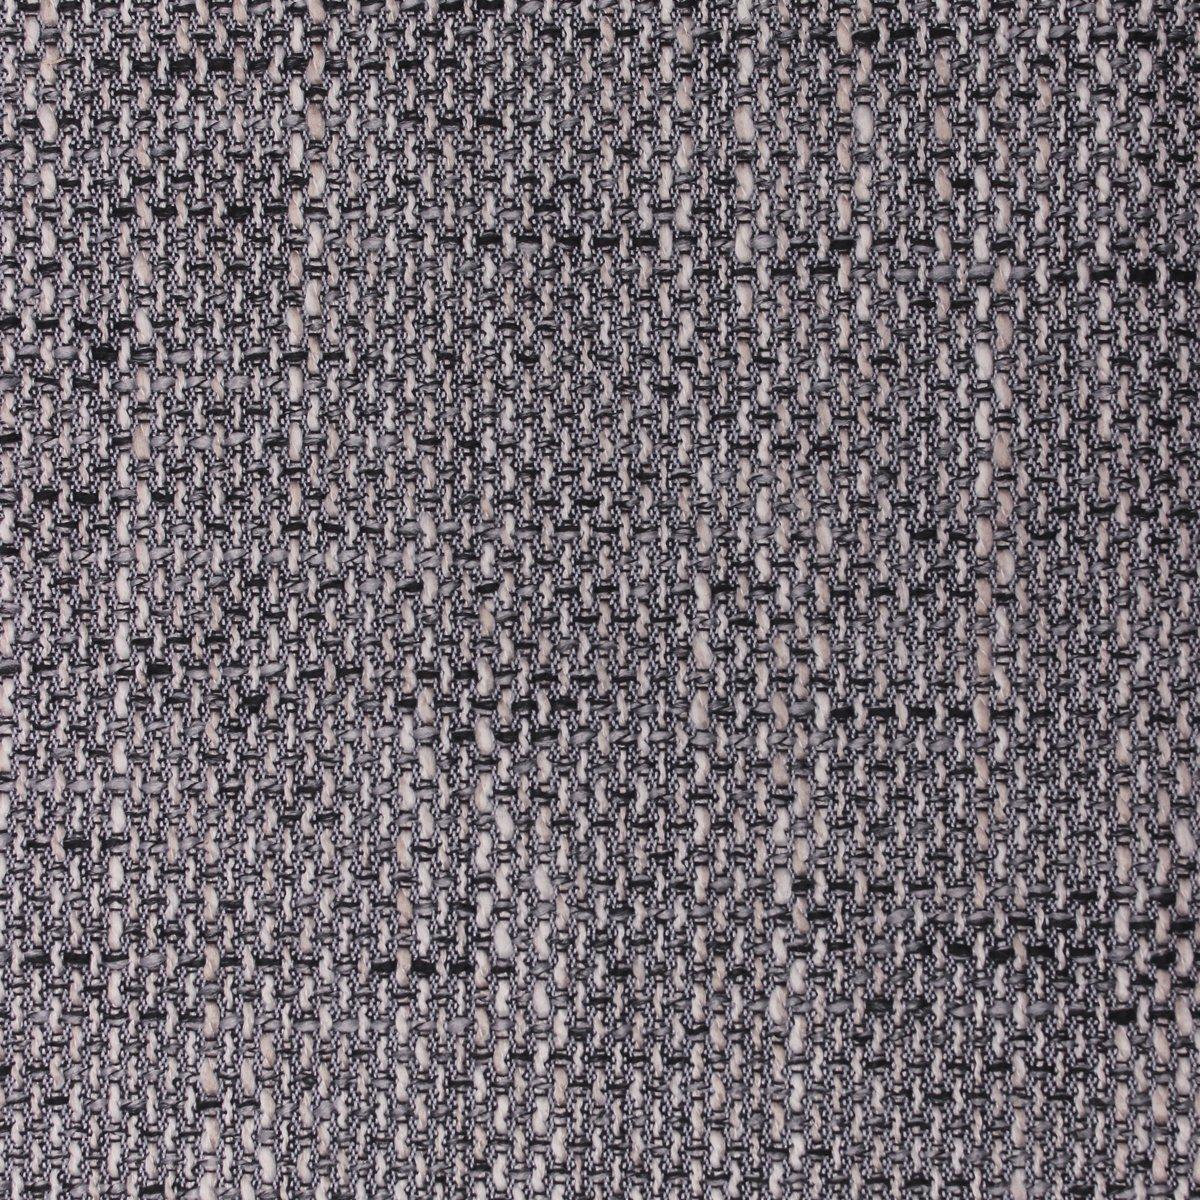 Möbelbär Kissen-Set Mia Magma Chenille Web-Stoff Polsterstoff grob gewebte Struktur Kissen-Hülle inkl. Feder-Füllung 50 cm x 50 cm   40 cm x 40 cm Dark Grau